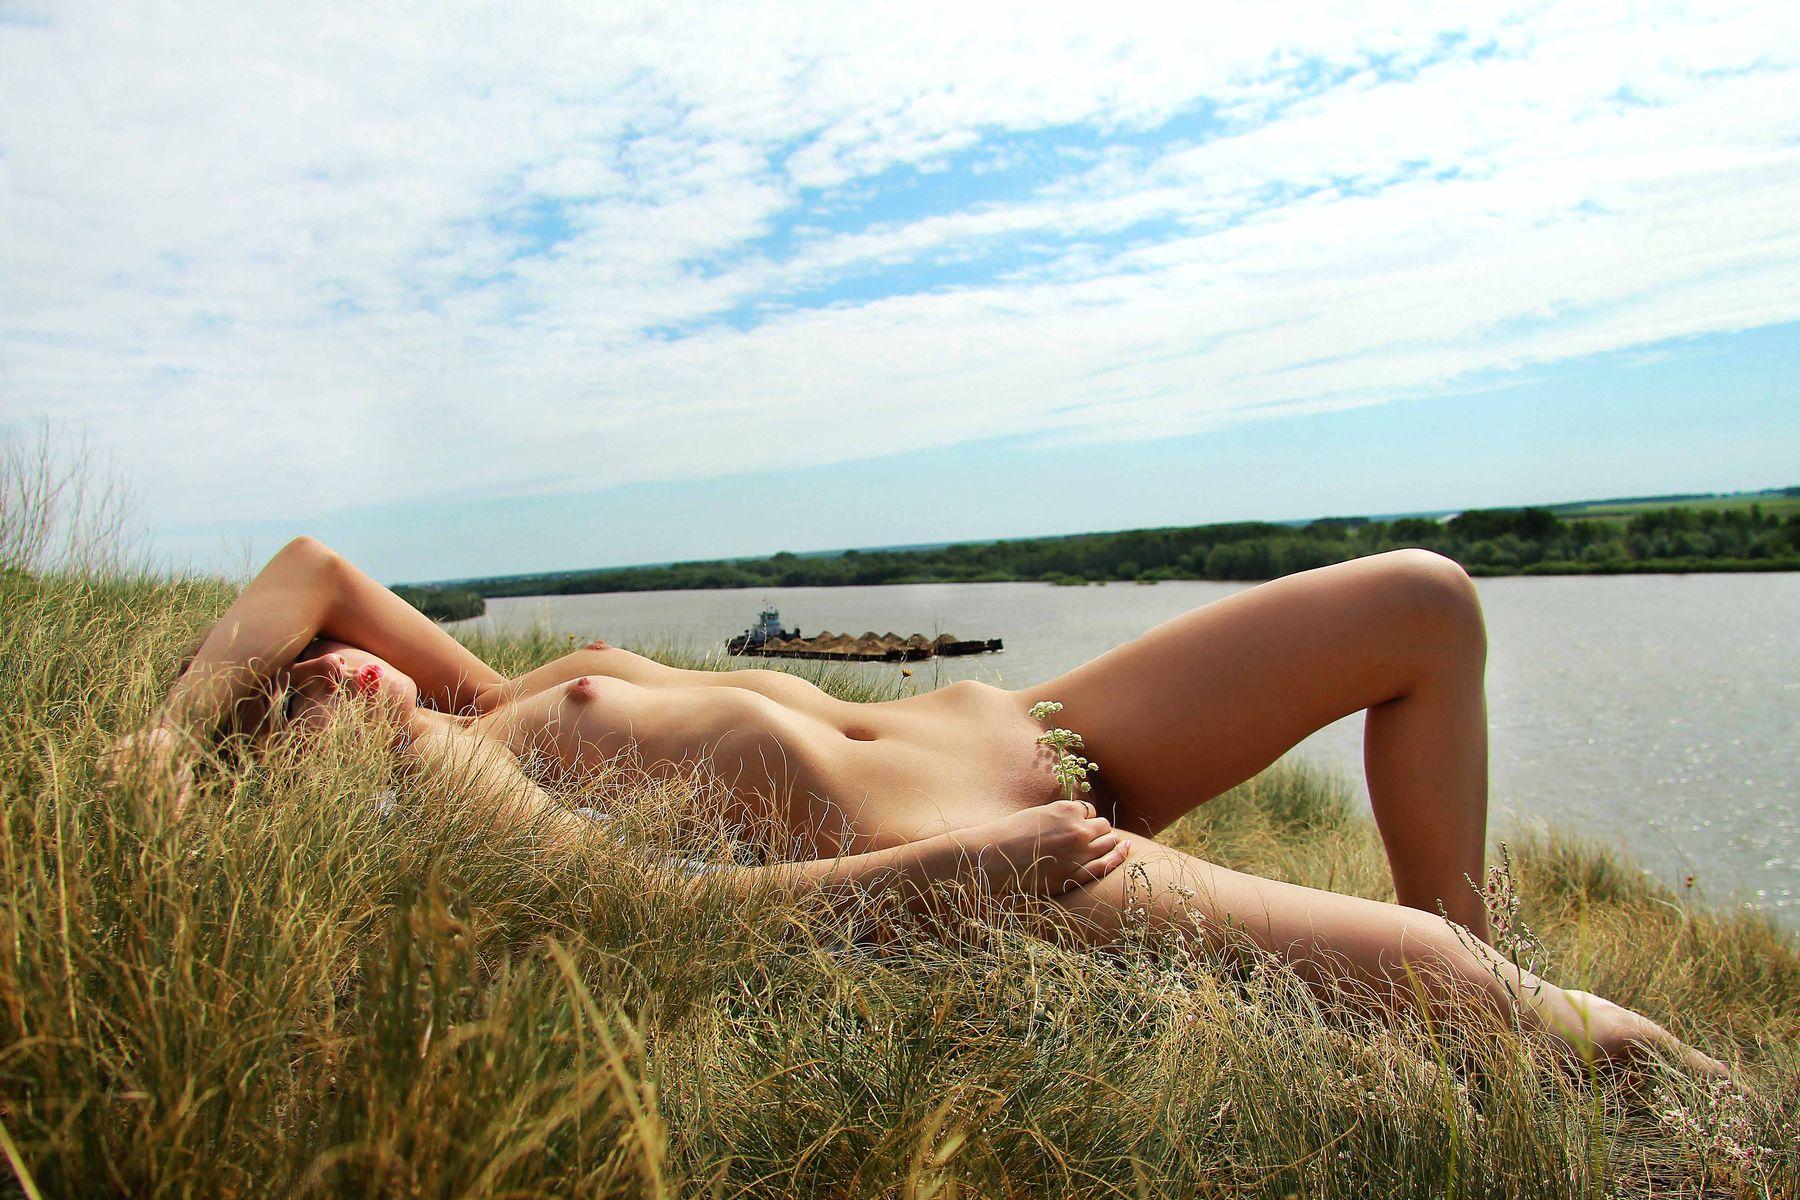 *** девушка модель жанр ню топлесс обнажённая фотография фотосессия фотограф павелтроицкий photo photography nature art nude artnu nu